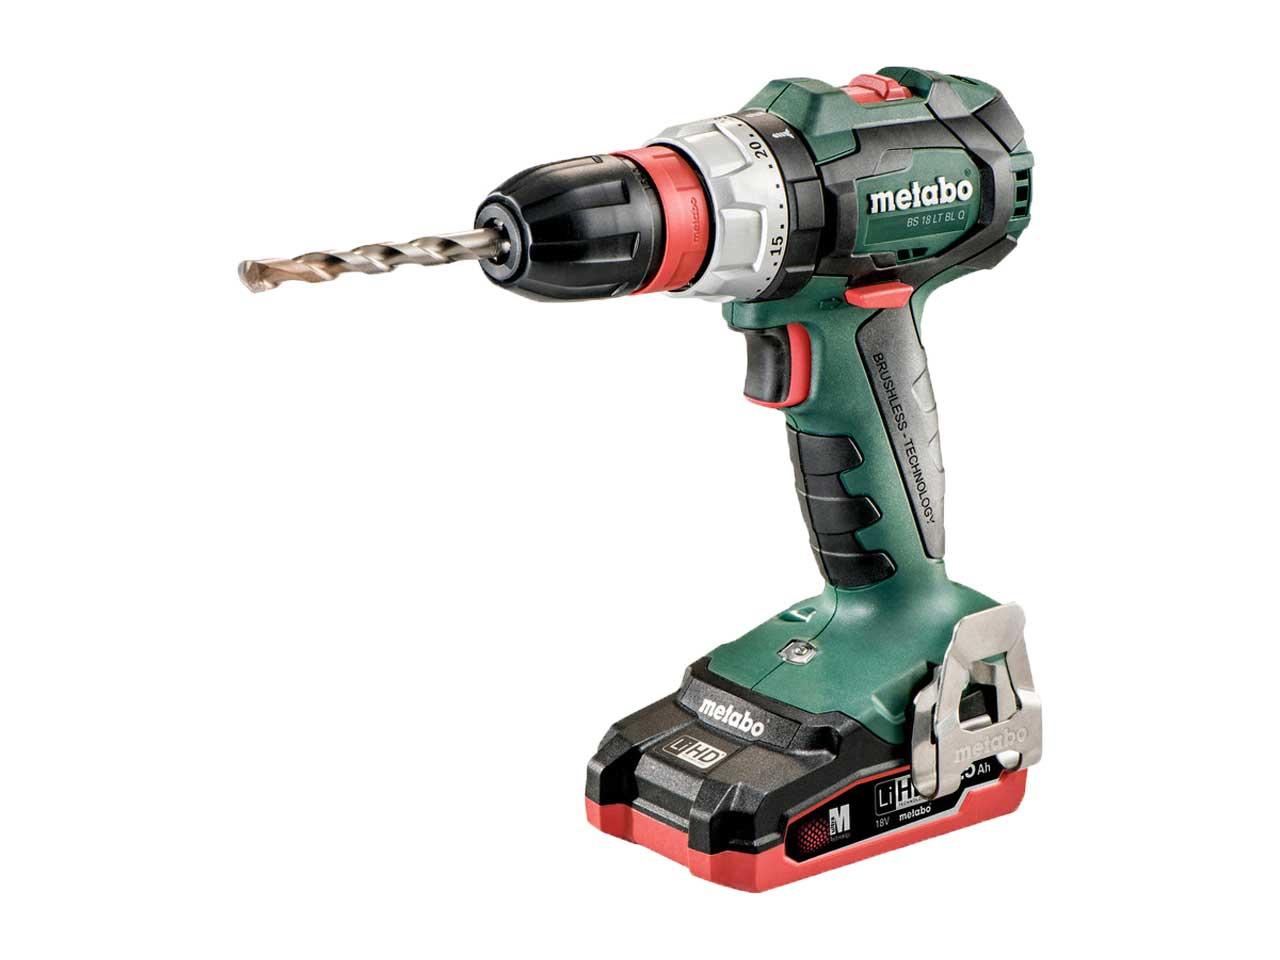 metabo bs 18 lt bl quick 18v lihd cordless drill screwdriver. Black Bedroom Furniture Sets. Home Design Ideas